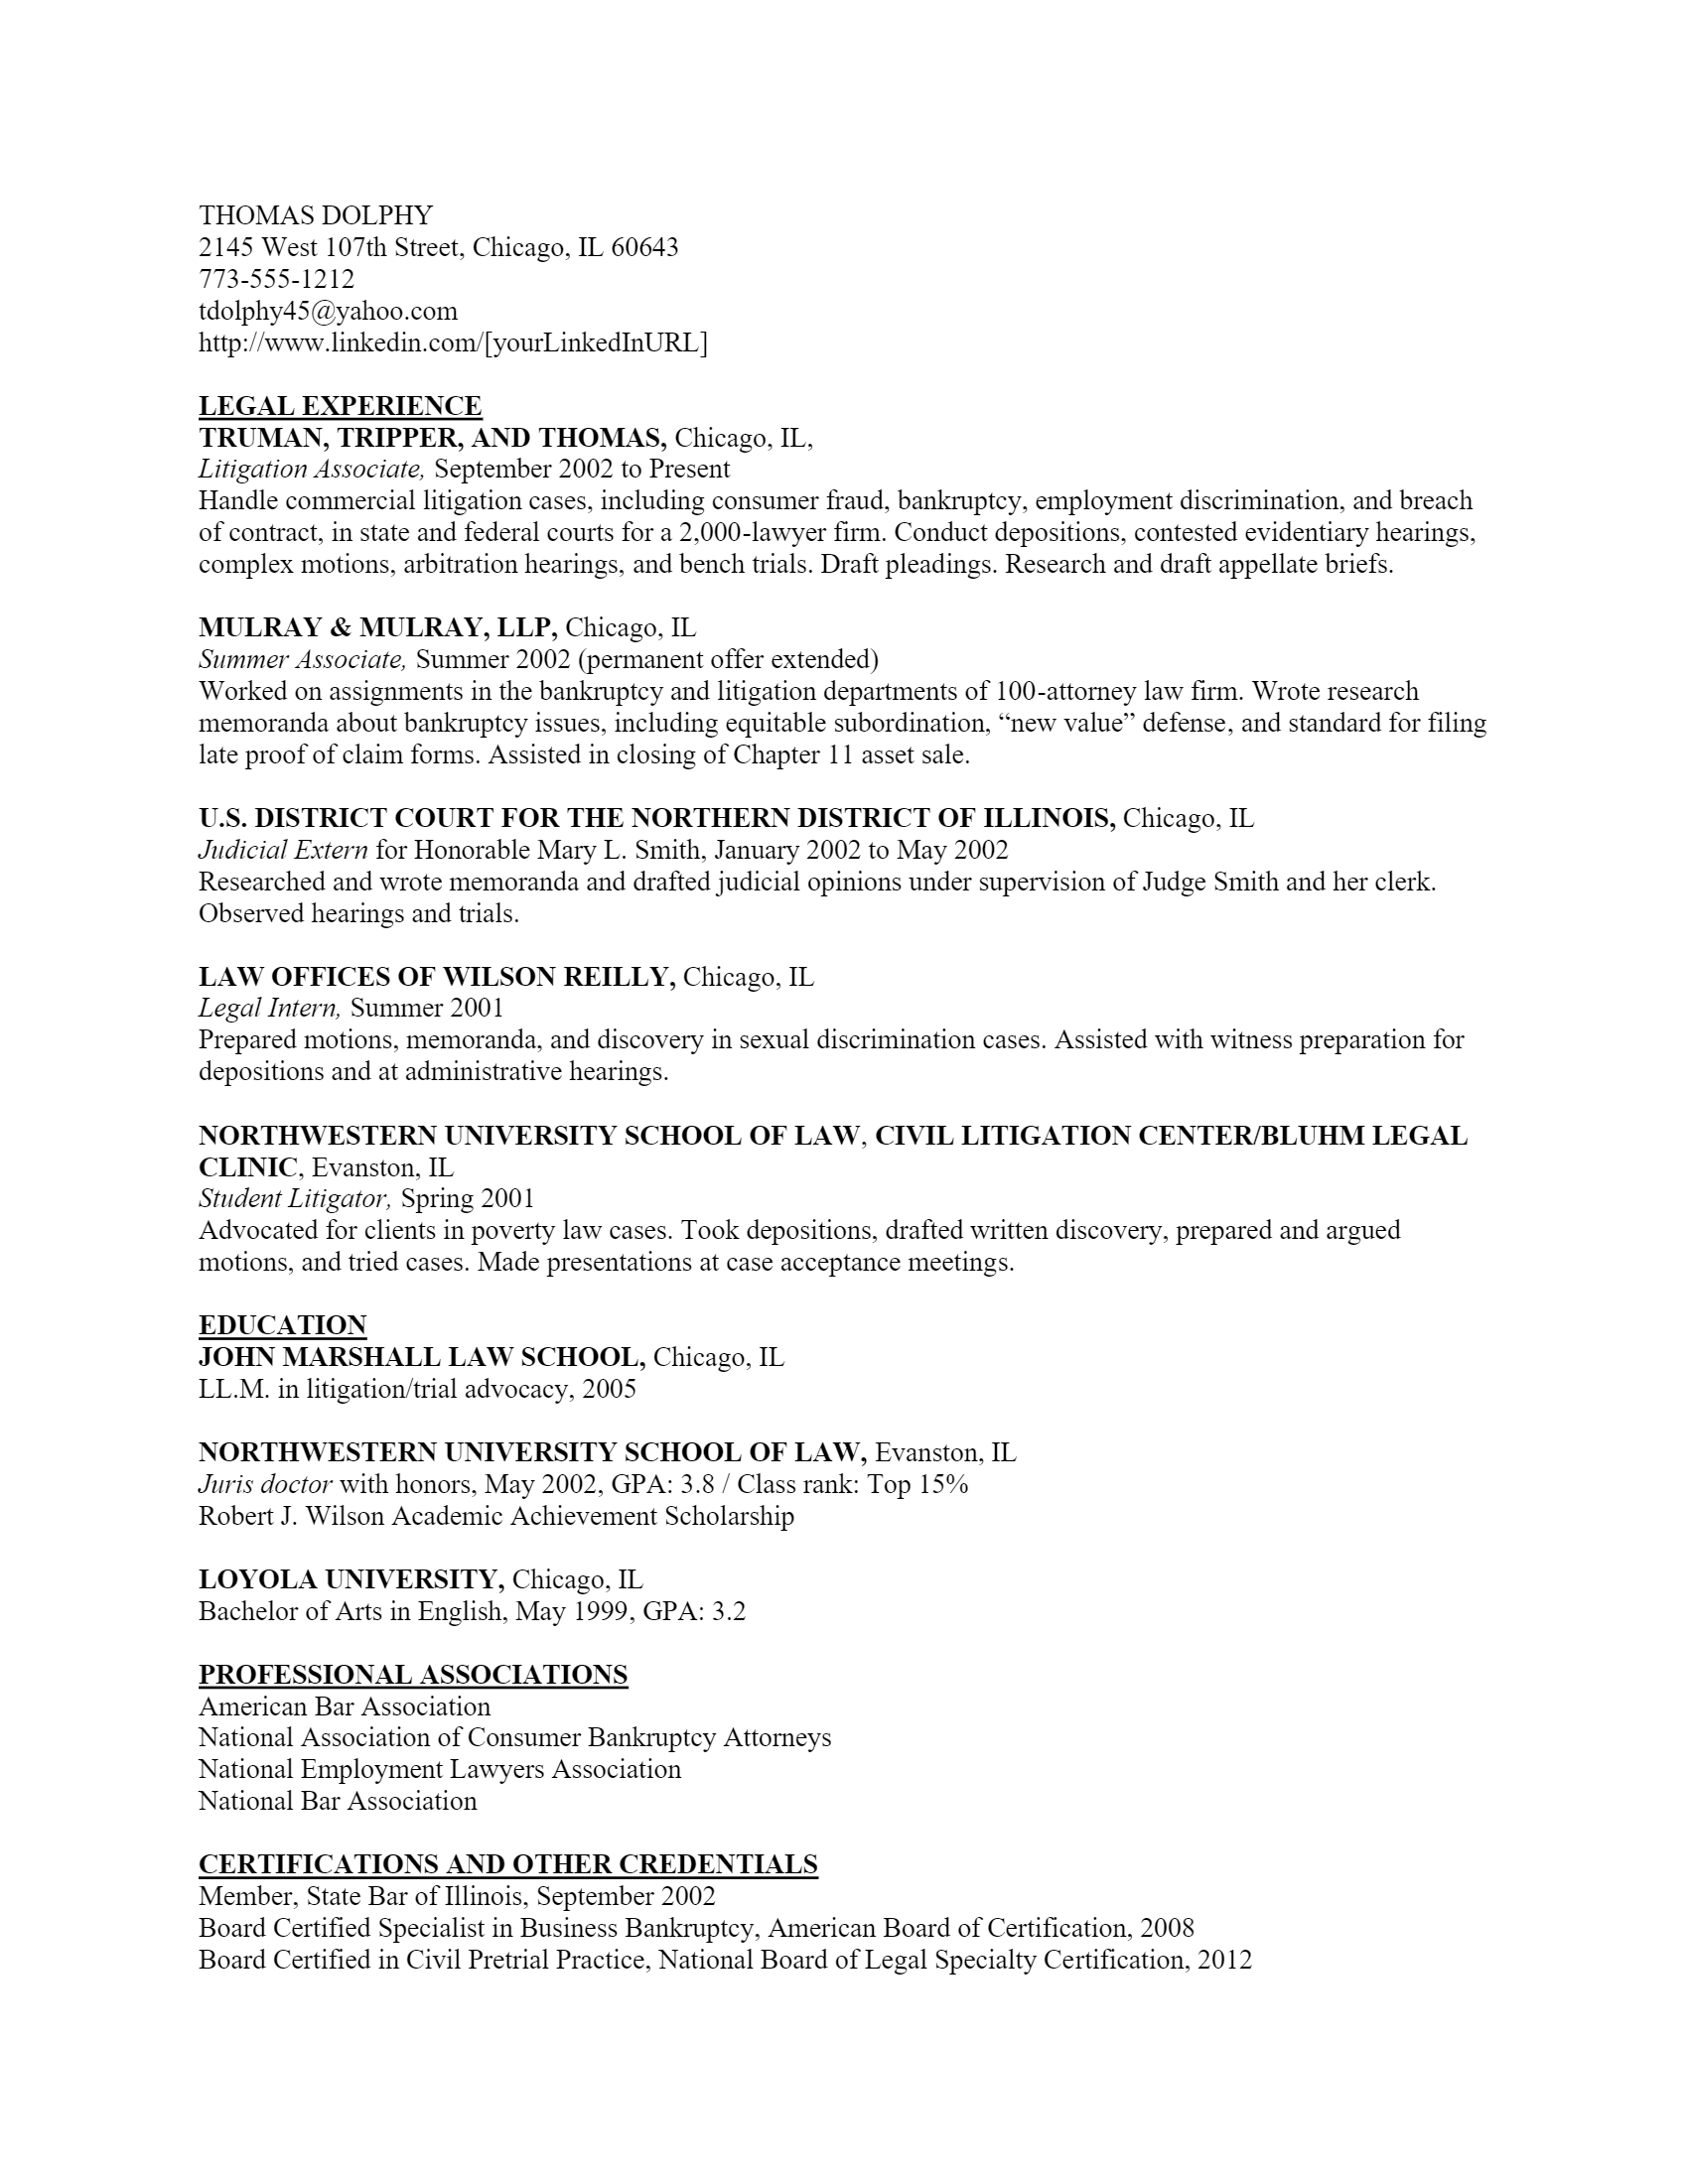 Law Resume .Docx (Word)